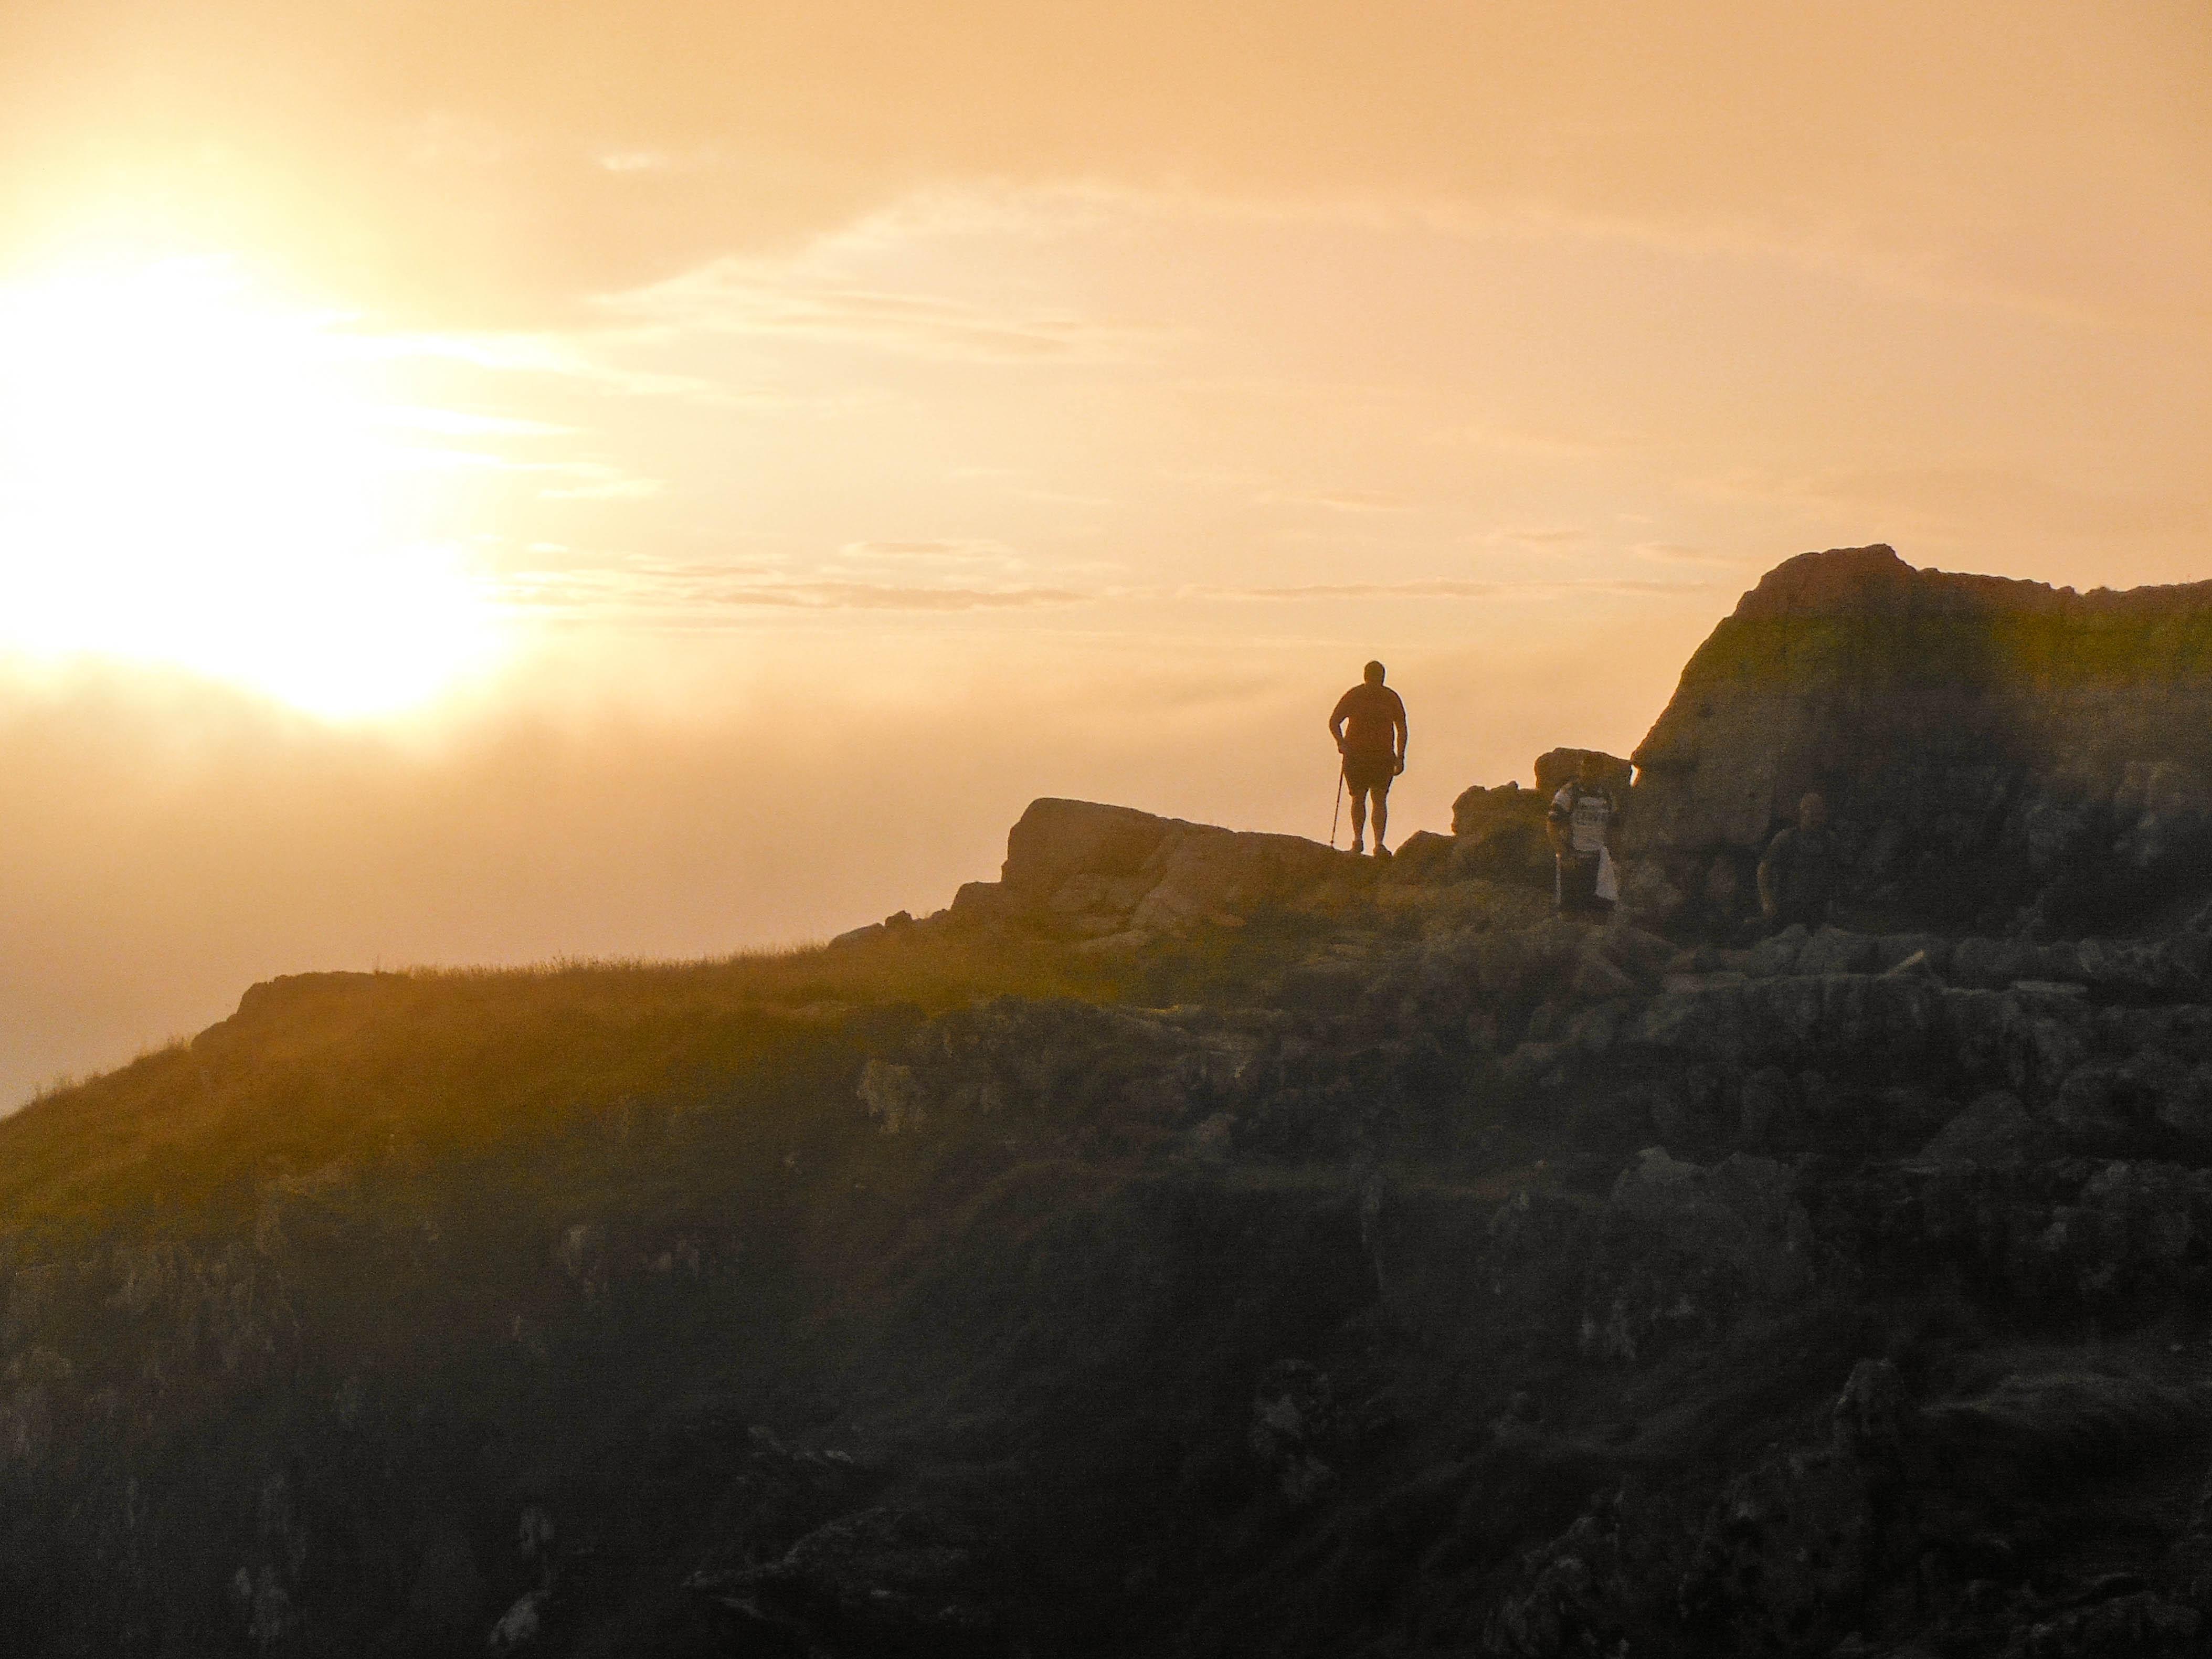 welsh-peak-challenge-august-bank-holiday-adventure